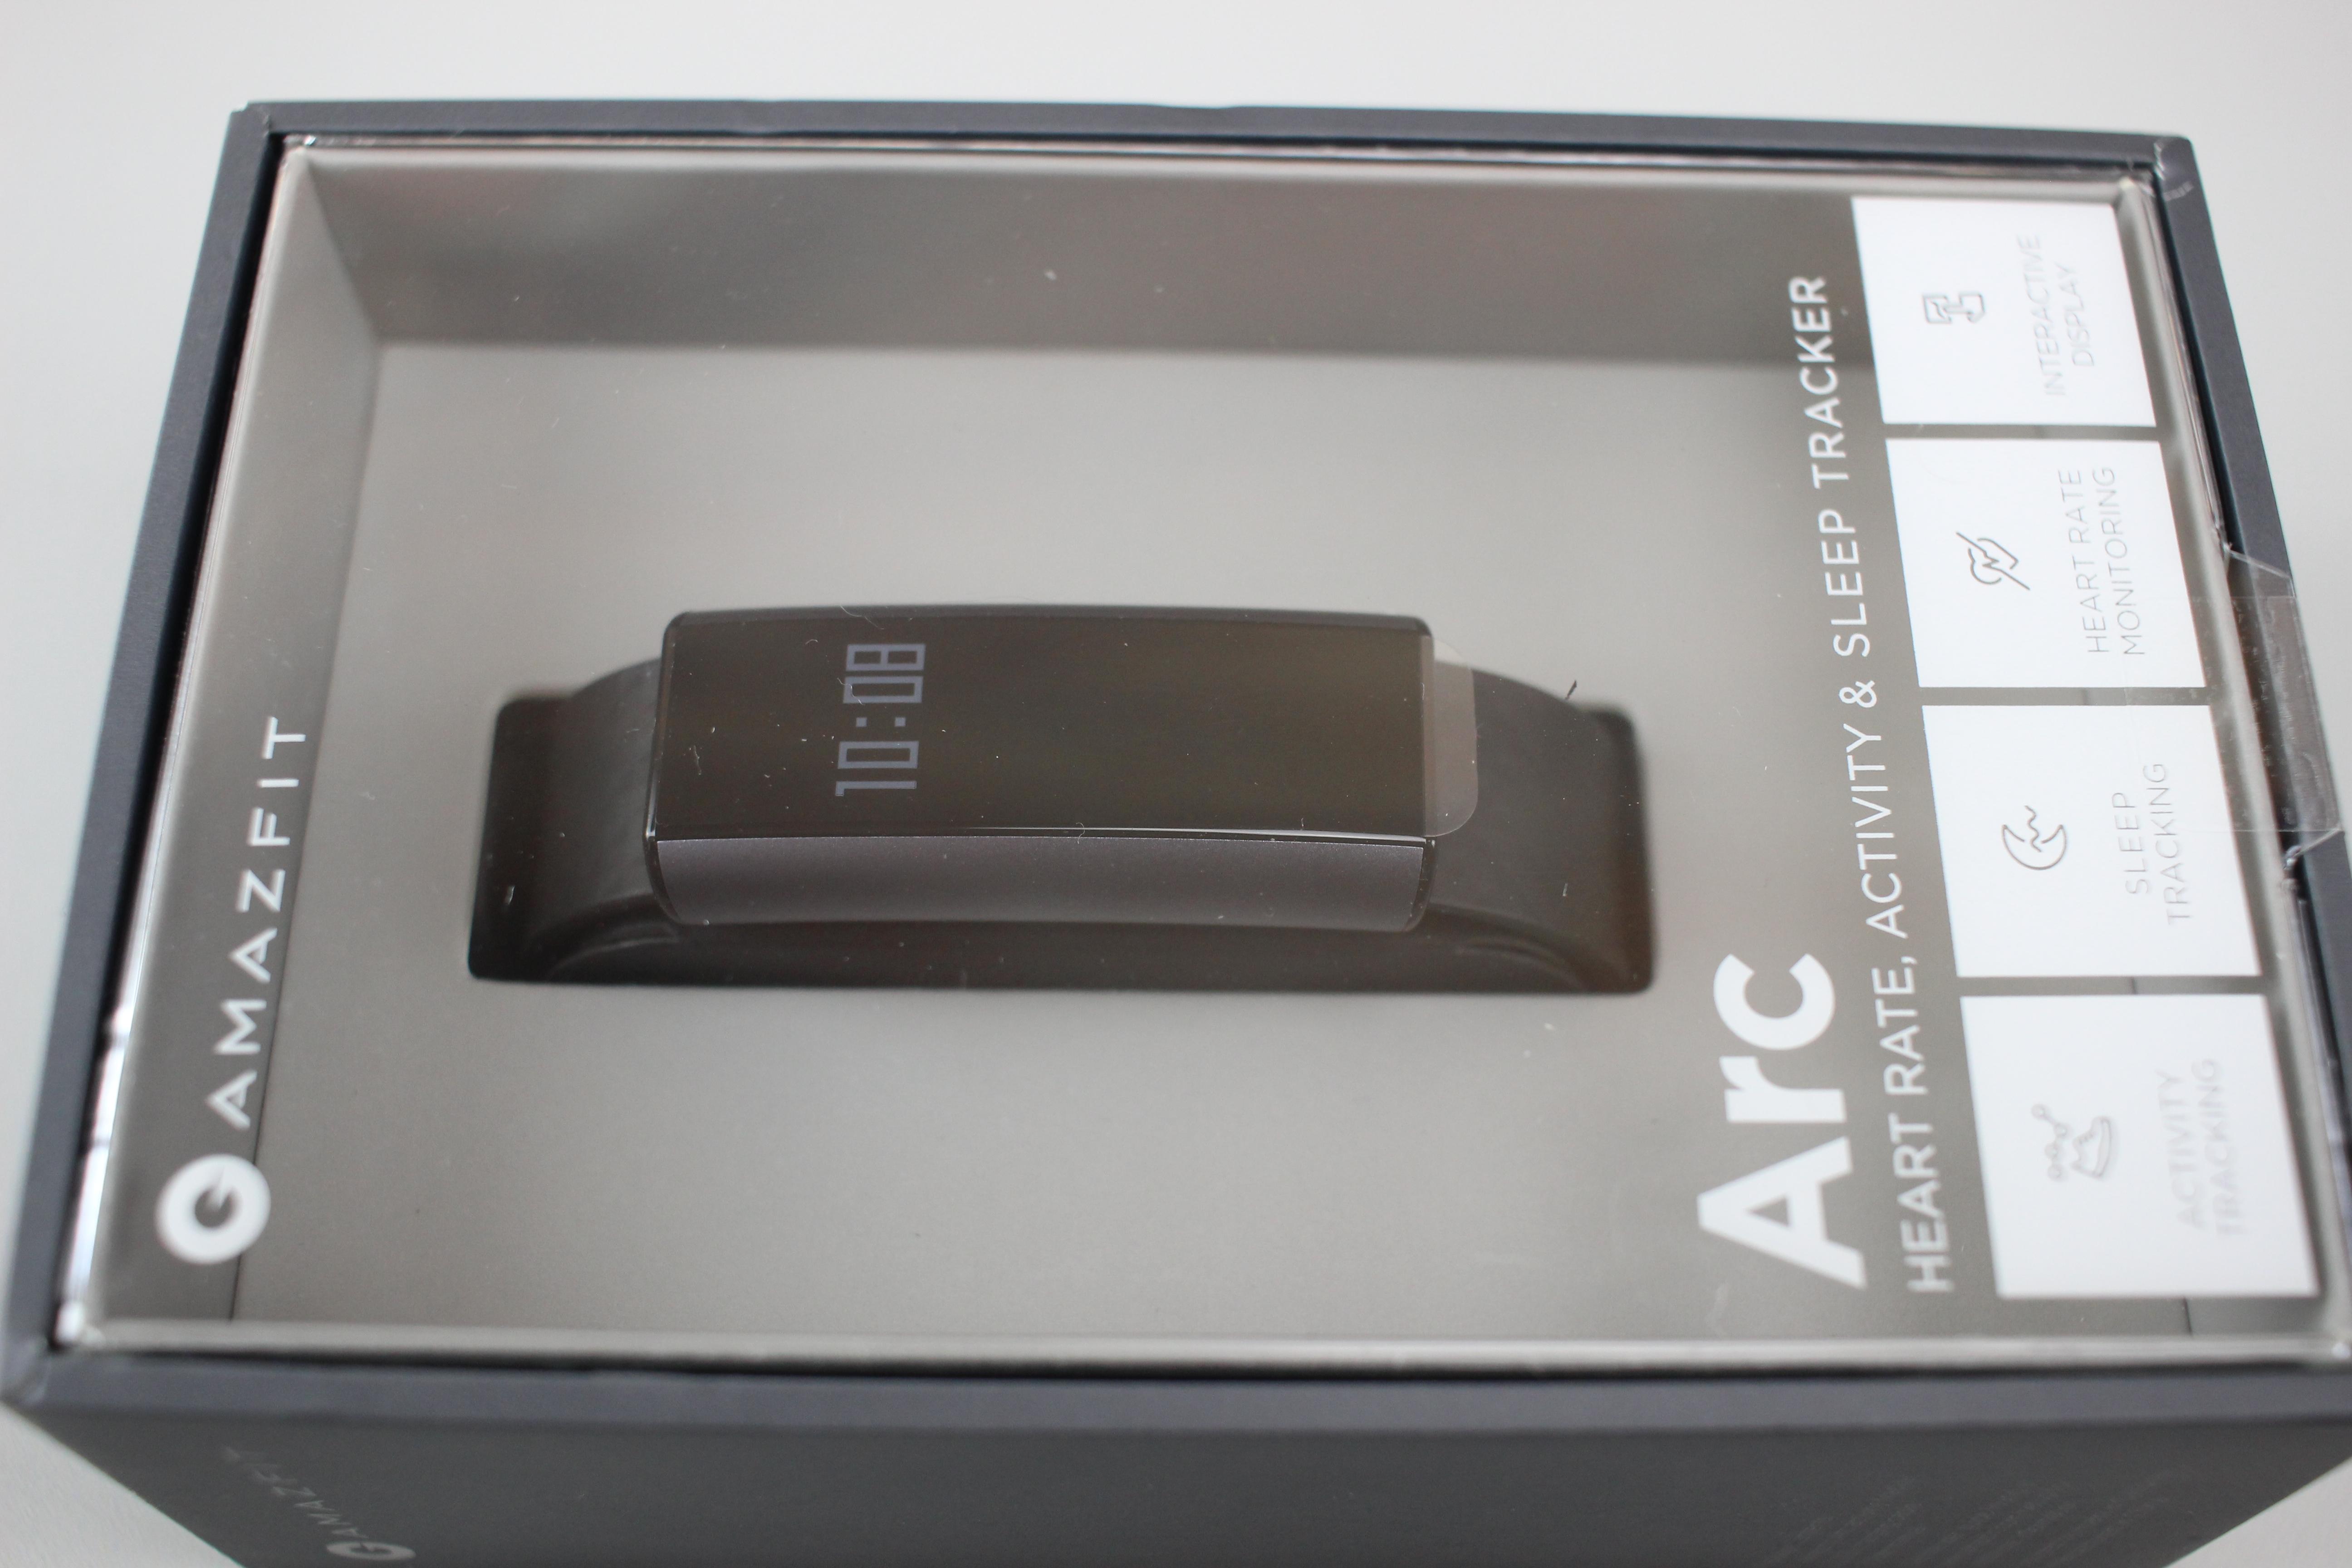 Xiaomi Huami Amazfit A1603 Arc Fitness Tracker The